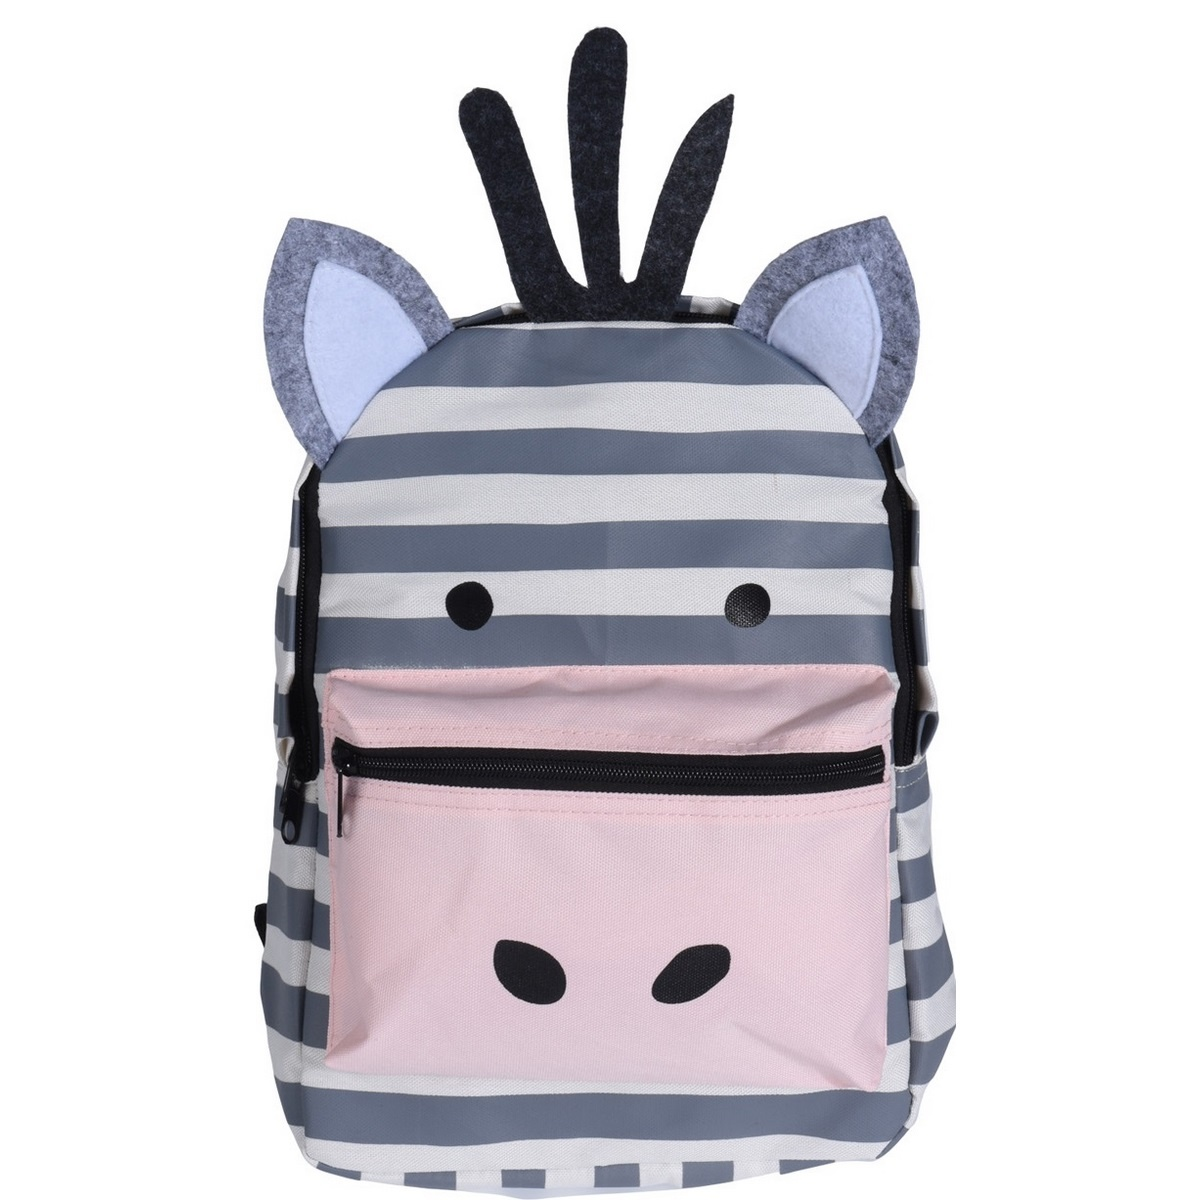 Koopman Dětský batoh Zebra, 22 x 8,5 x 32 cm